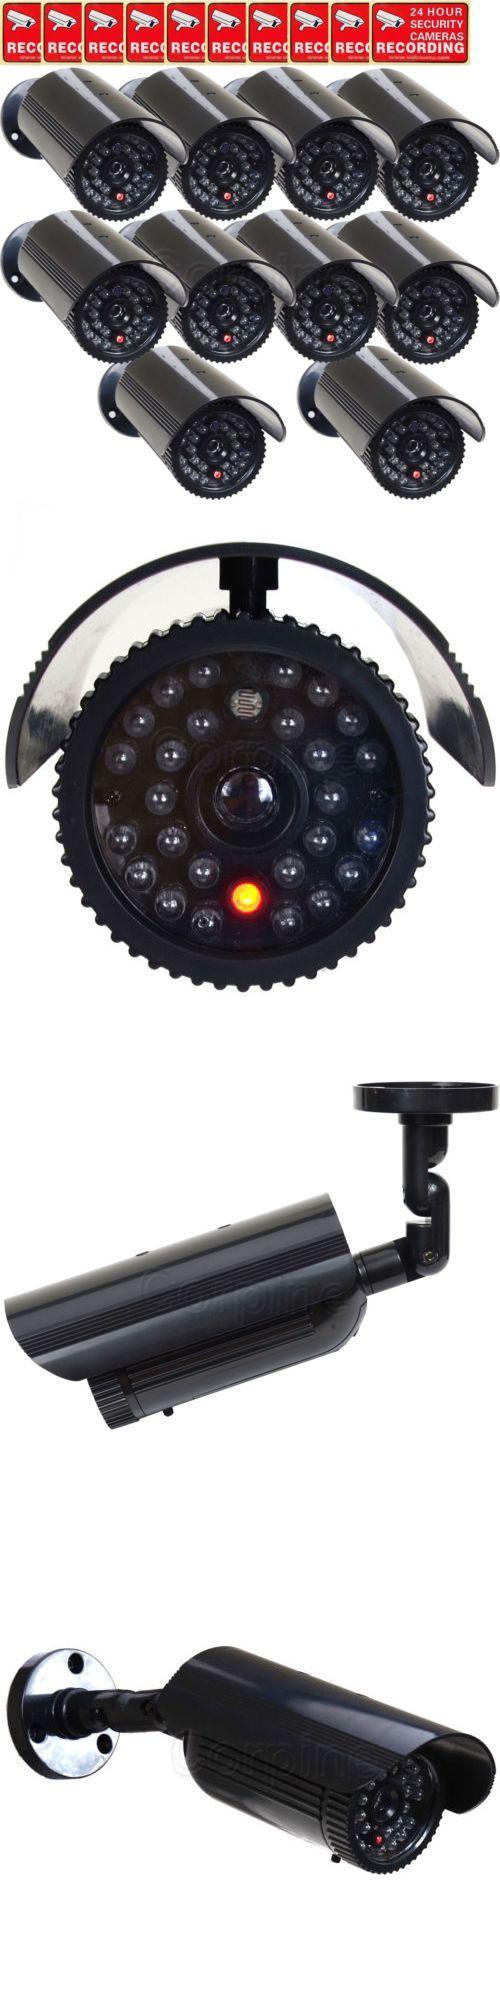 Dummy Cameras: 10X Dummy Security Camera Fake Ir Leds Flashing Light Home Cctv Surveillance Mjx -> BUY IT NOW ONLY: $104.9 on eBay!